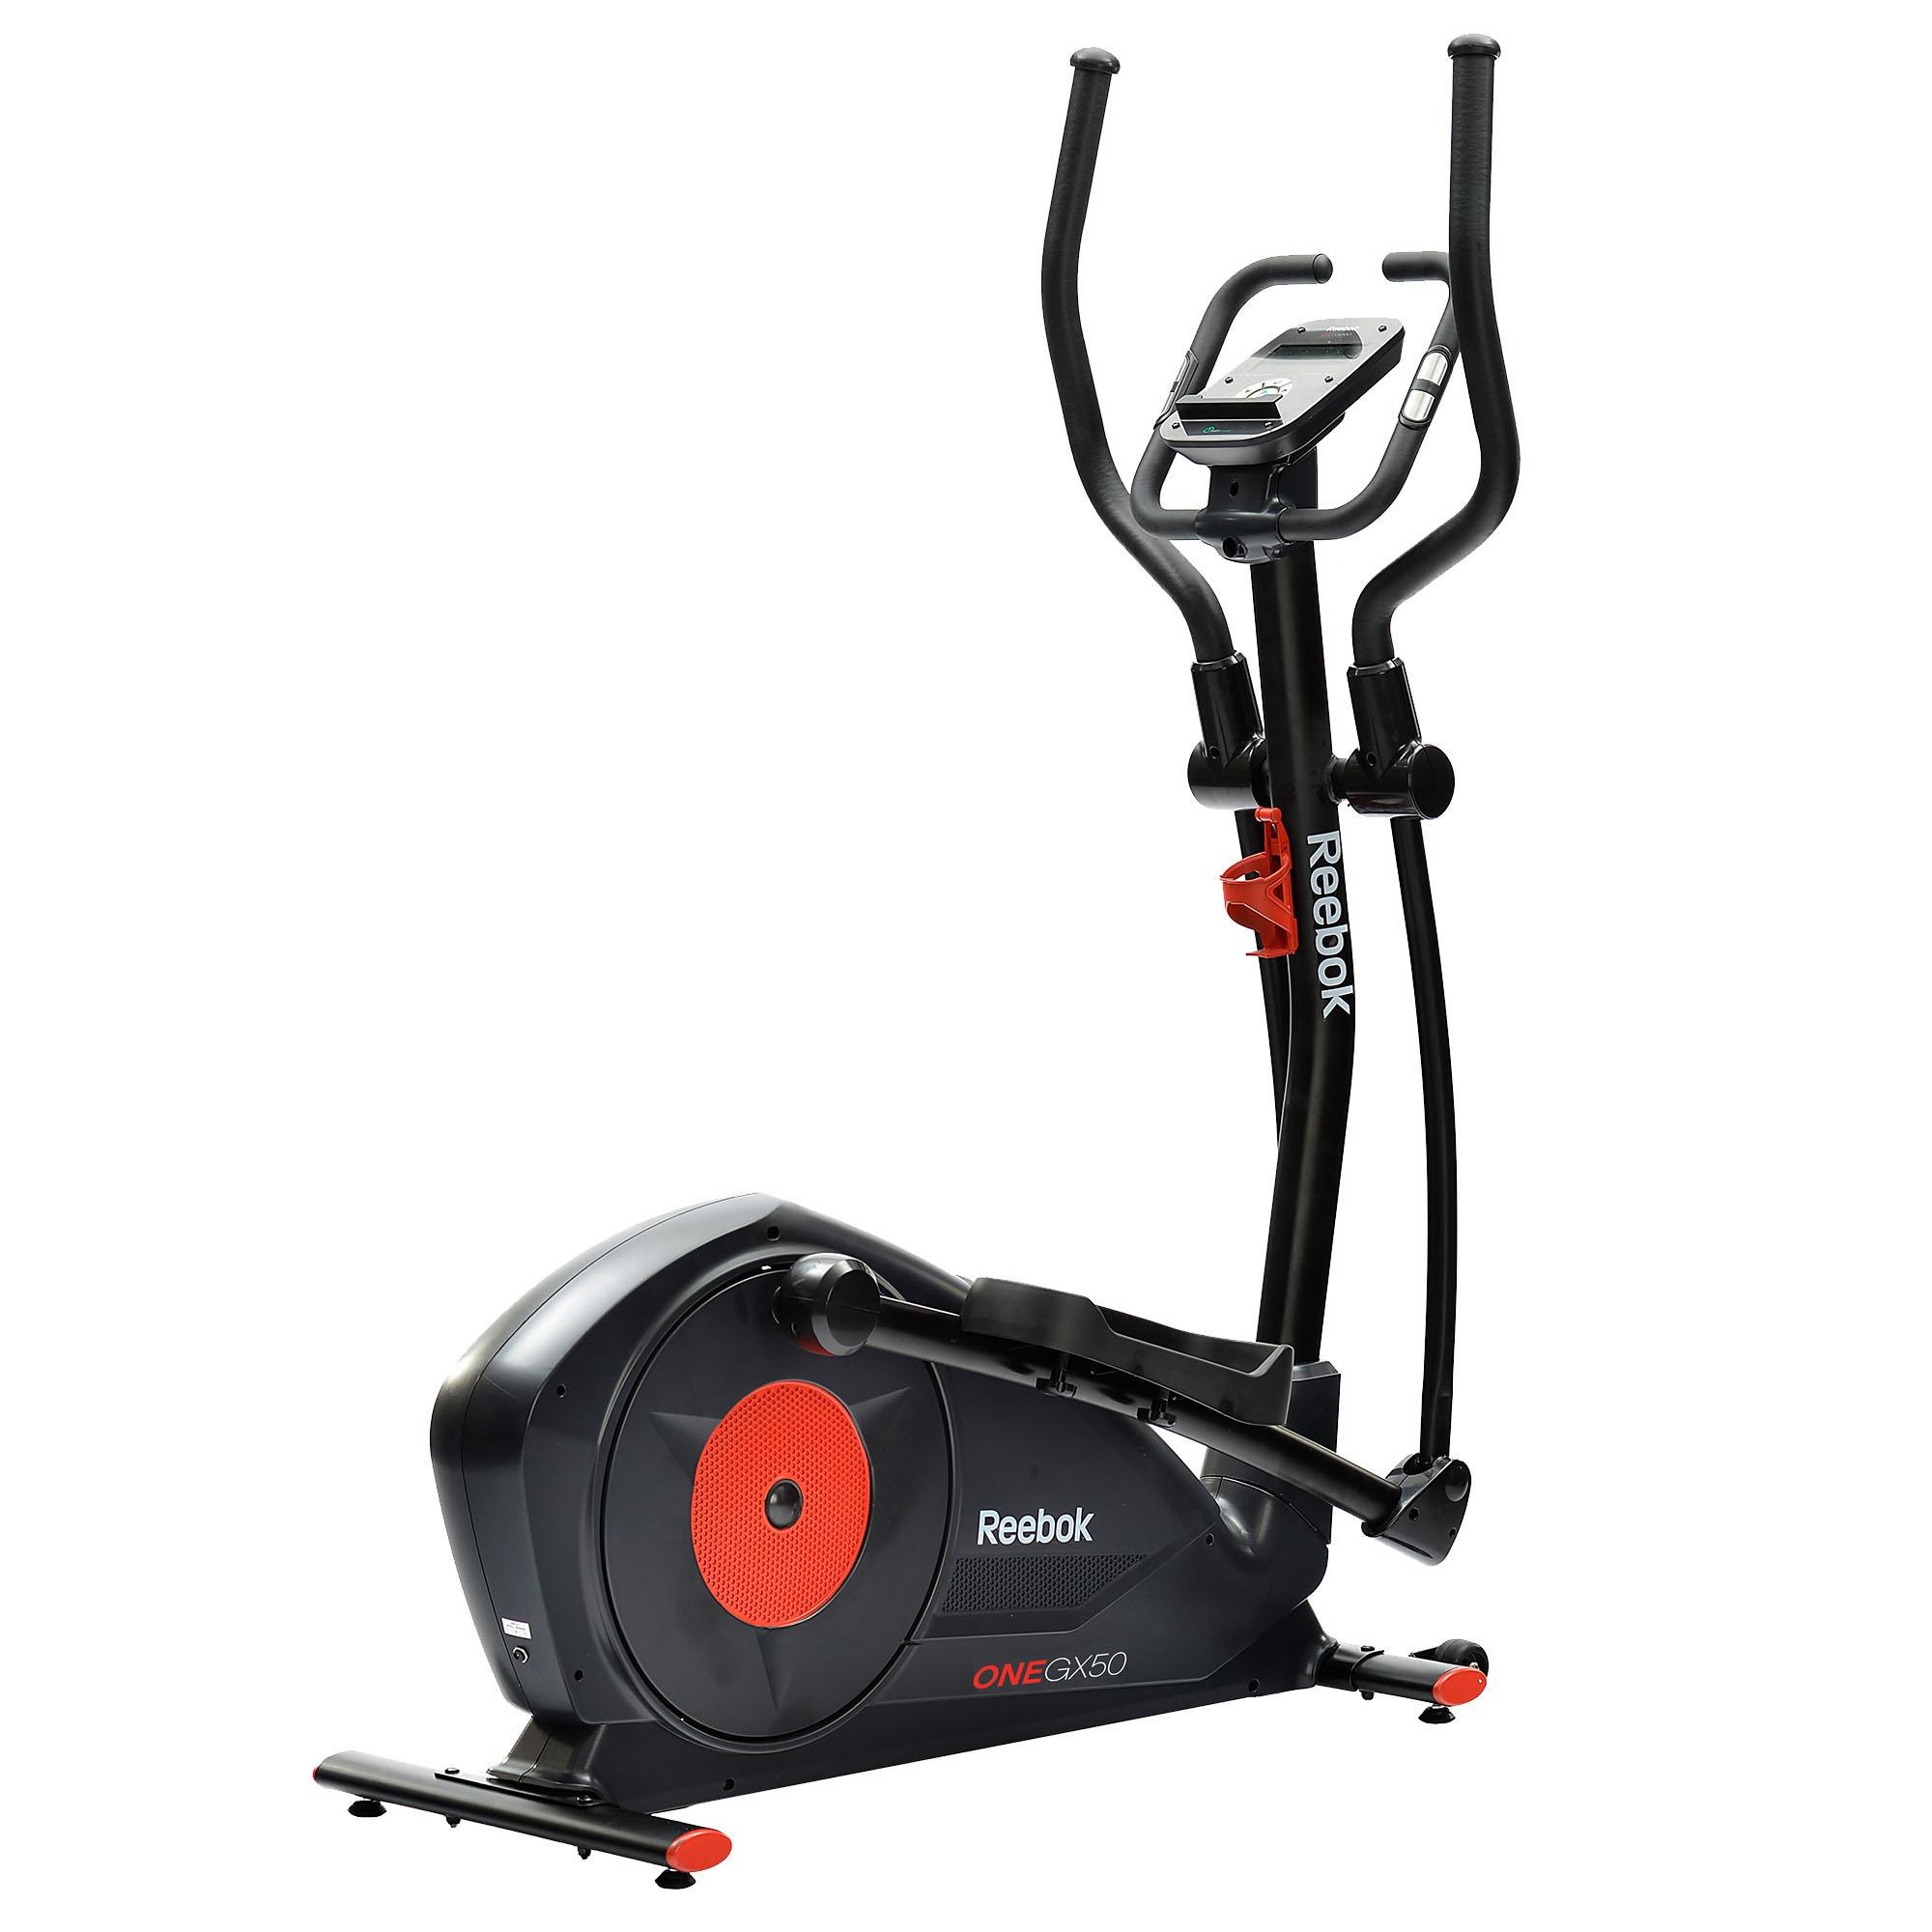 reebok elliptical machine reviews